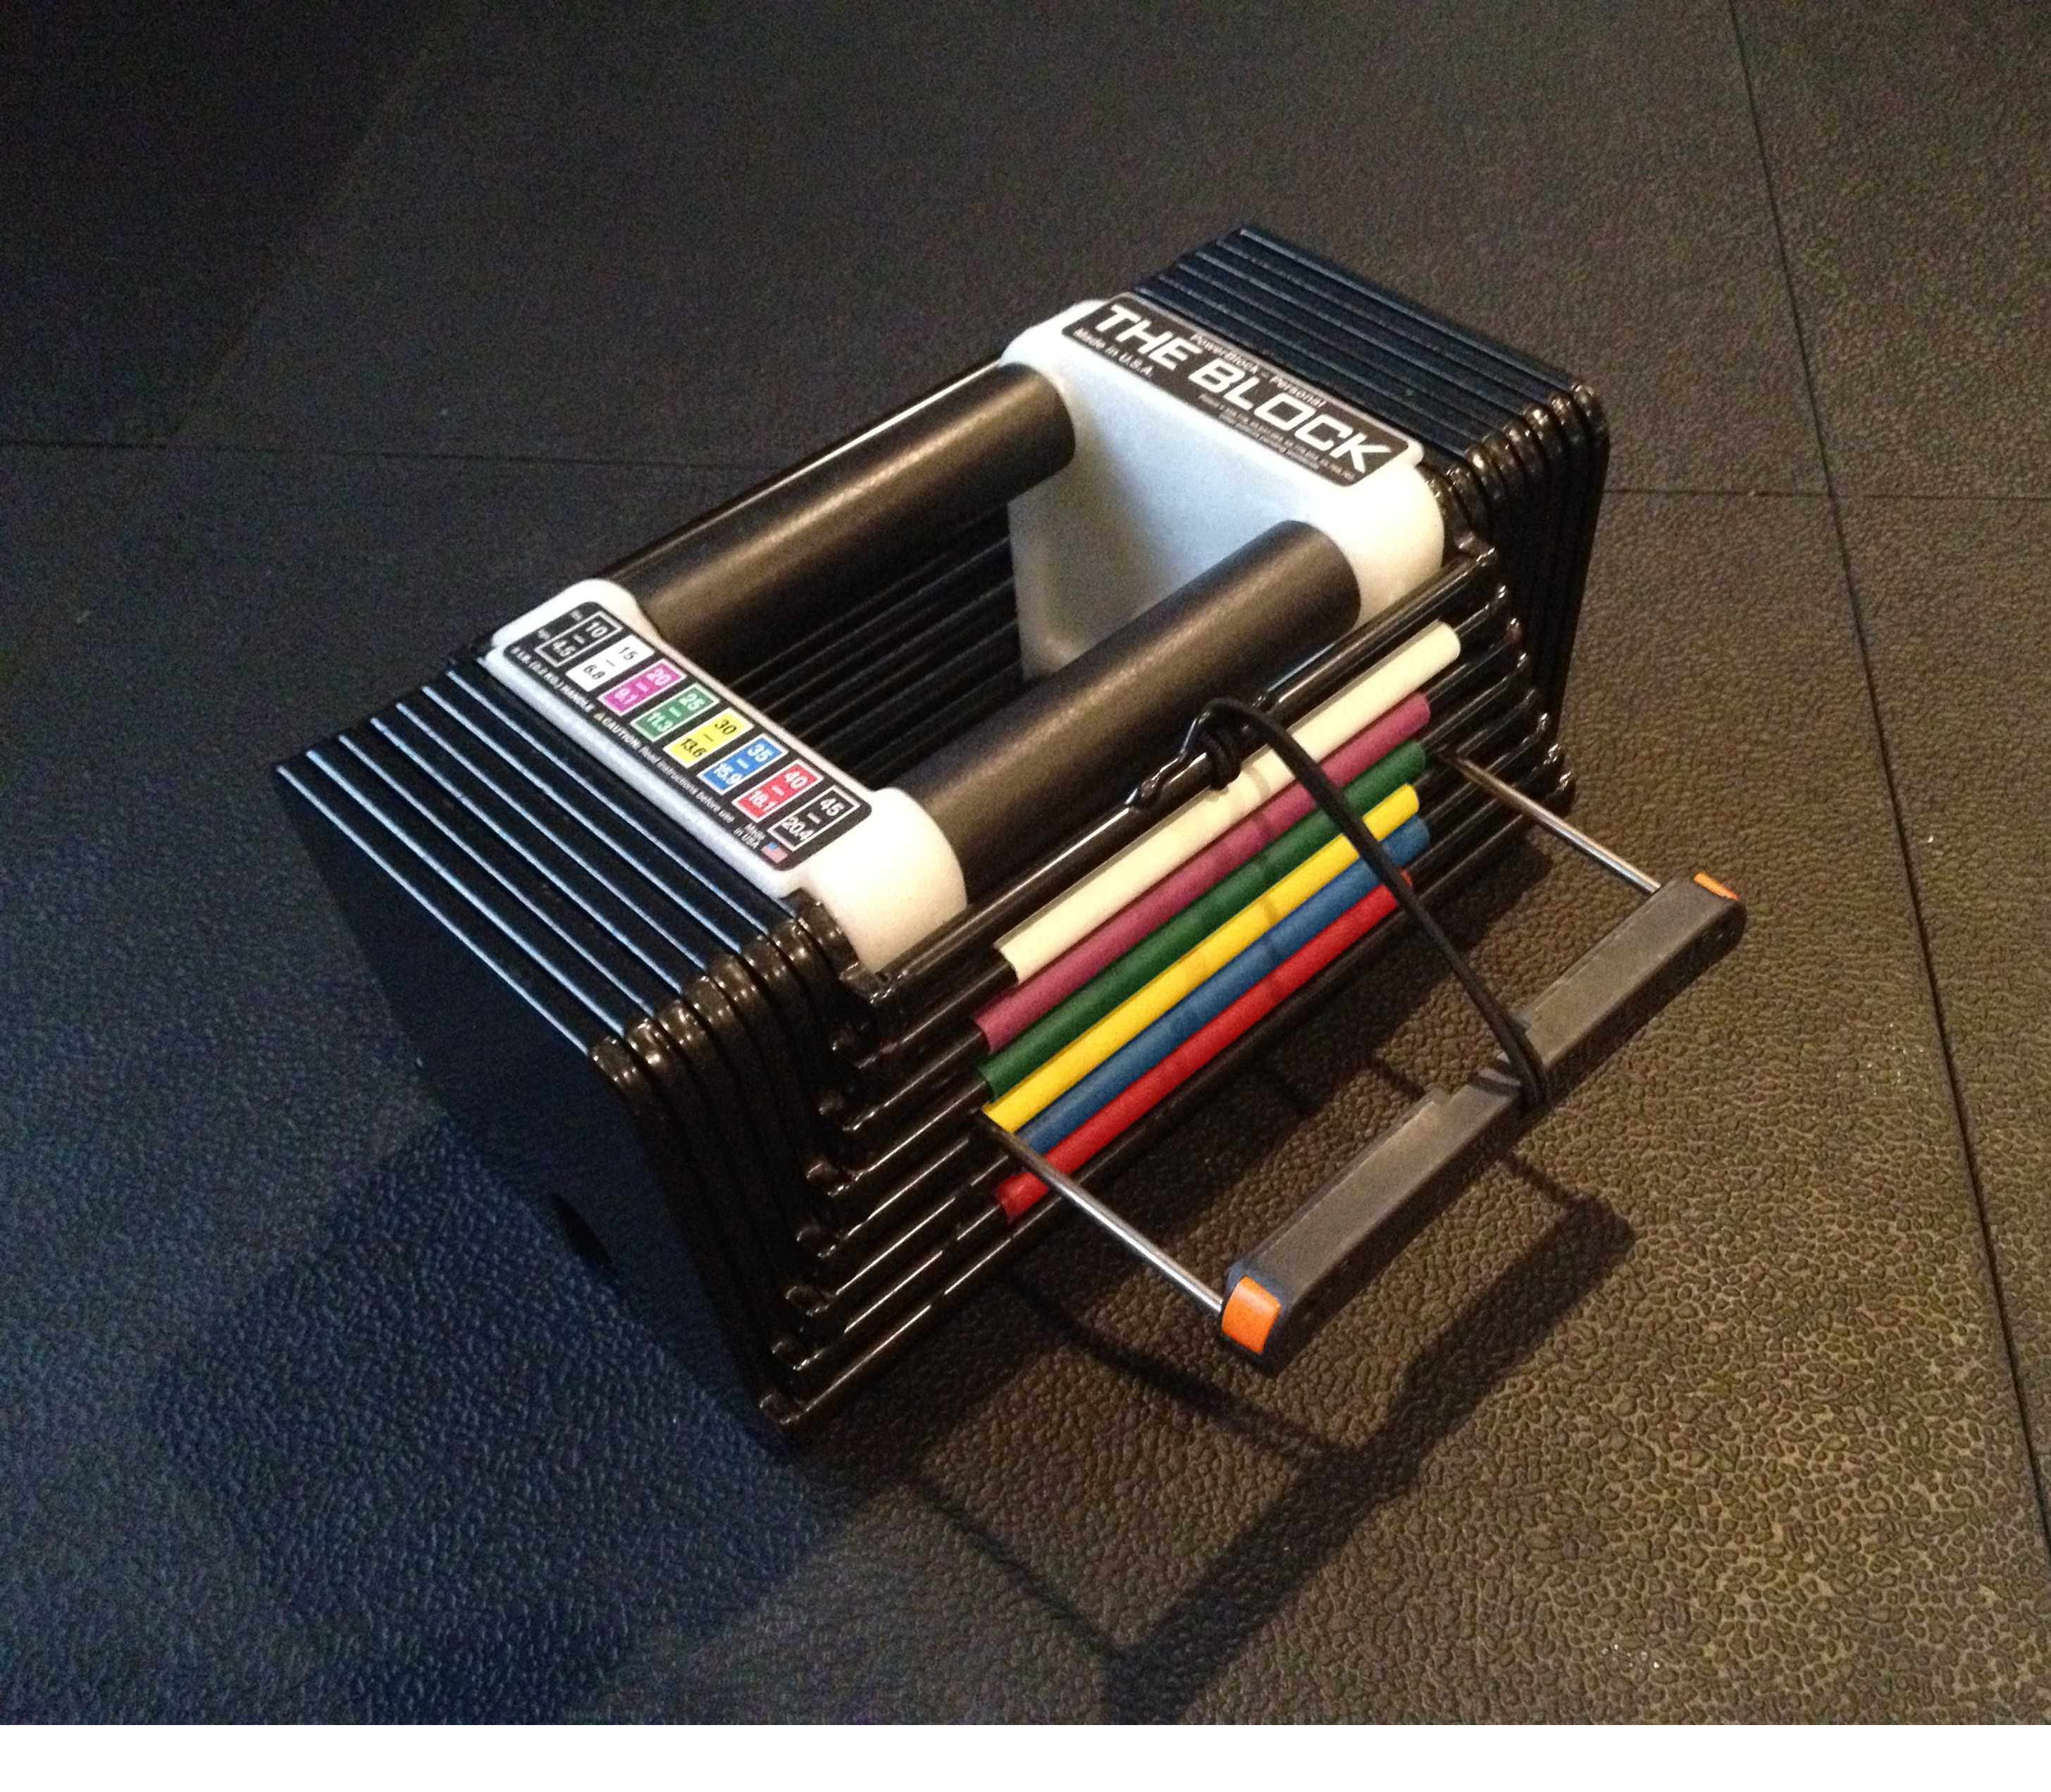 Powerblock Adjustable Dumbbells Or Not?